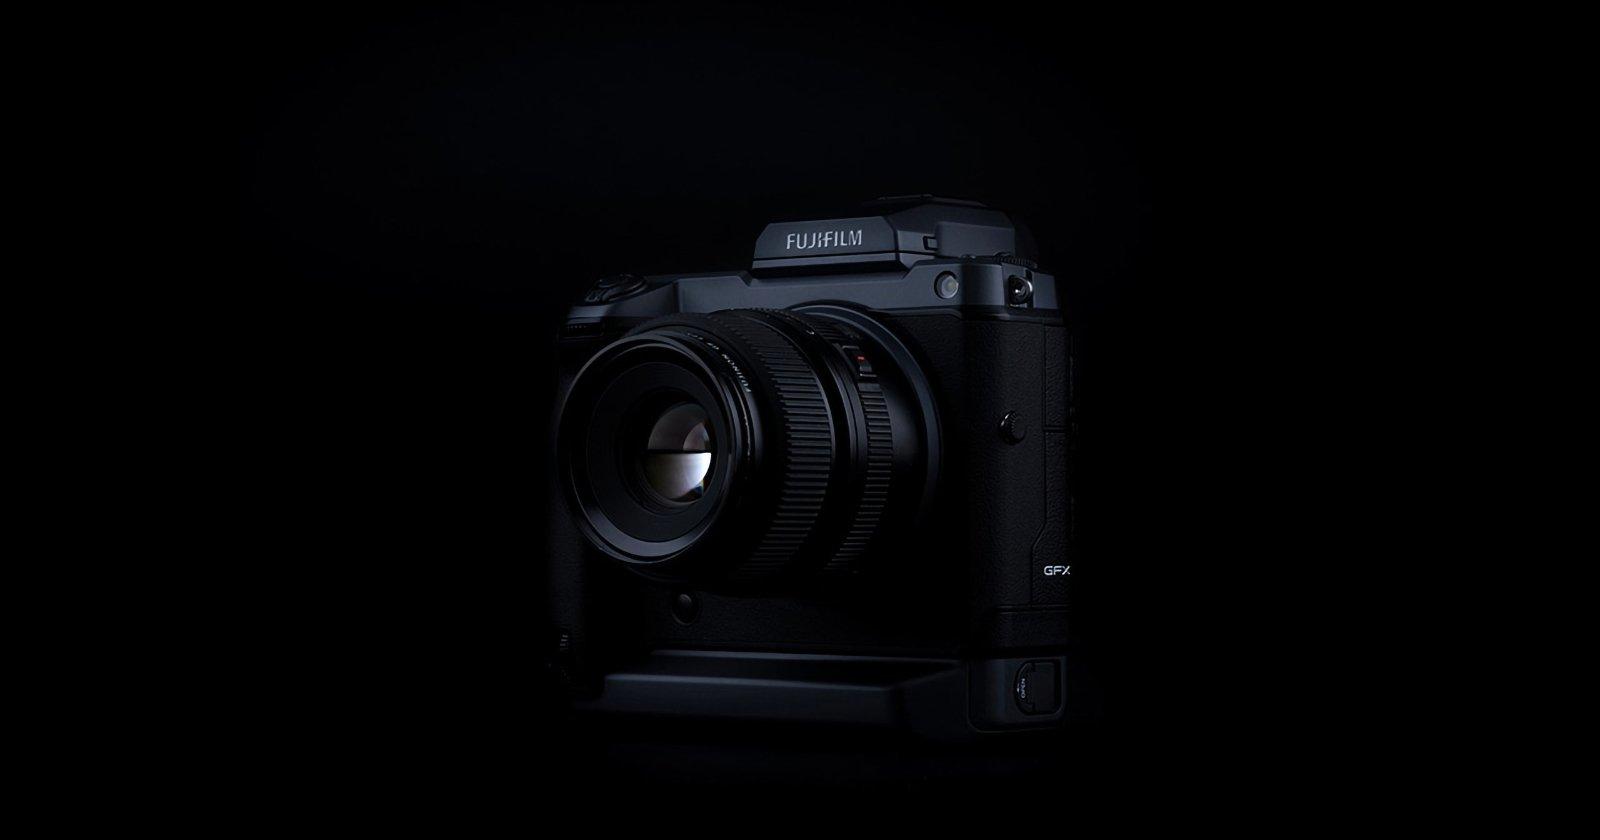 Fujifilm Announces GFX100 IR, a Forensics-Focused Infrared Camera - PetaPixel